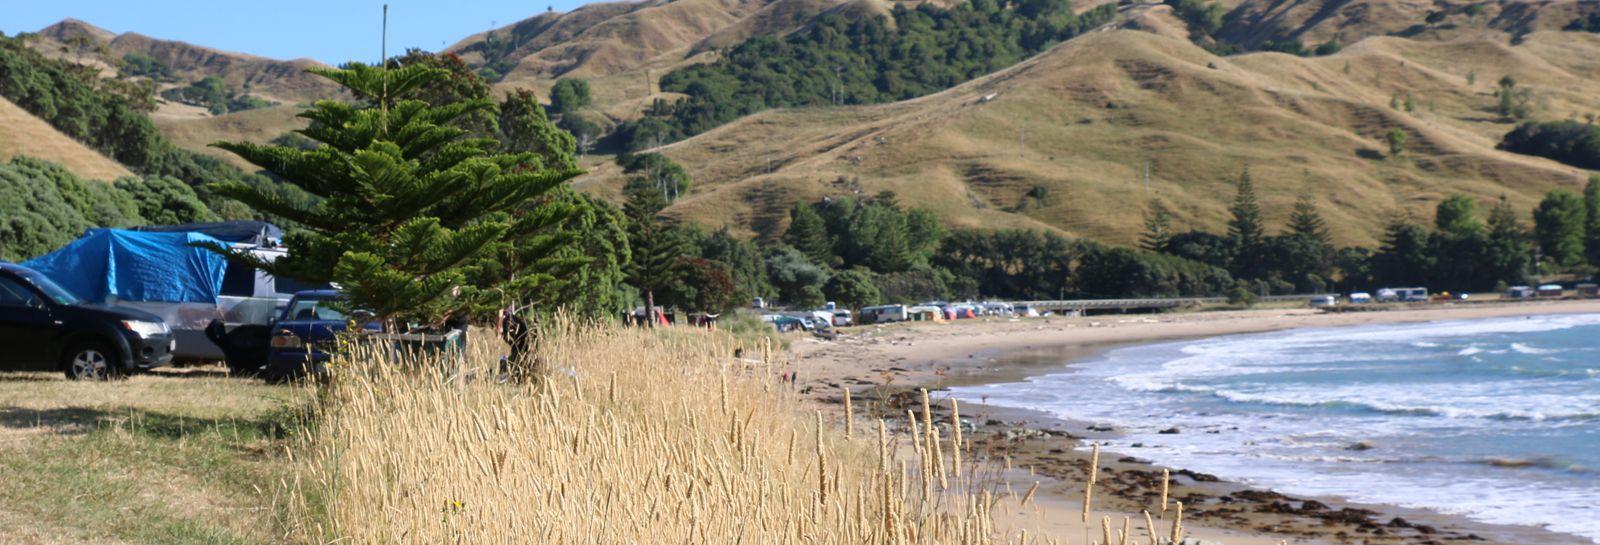 Turihaua Beach banner image